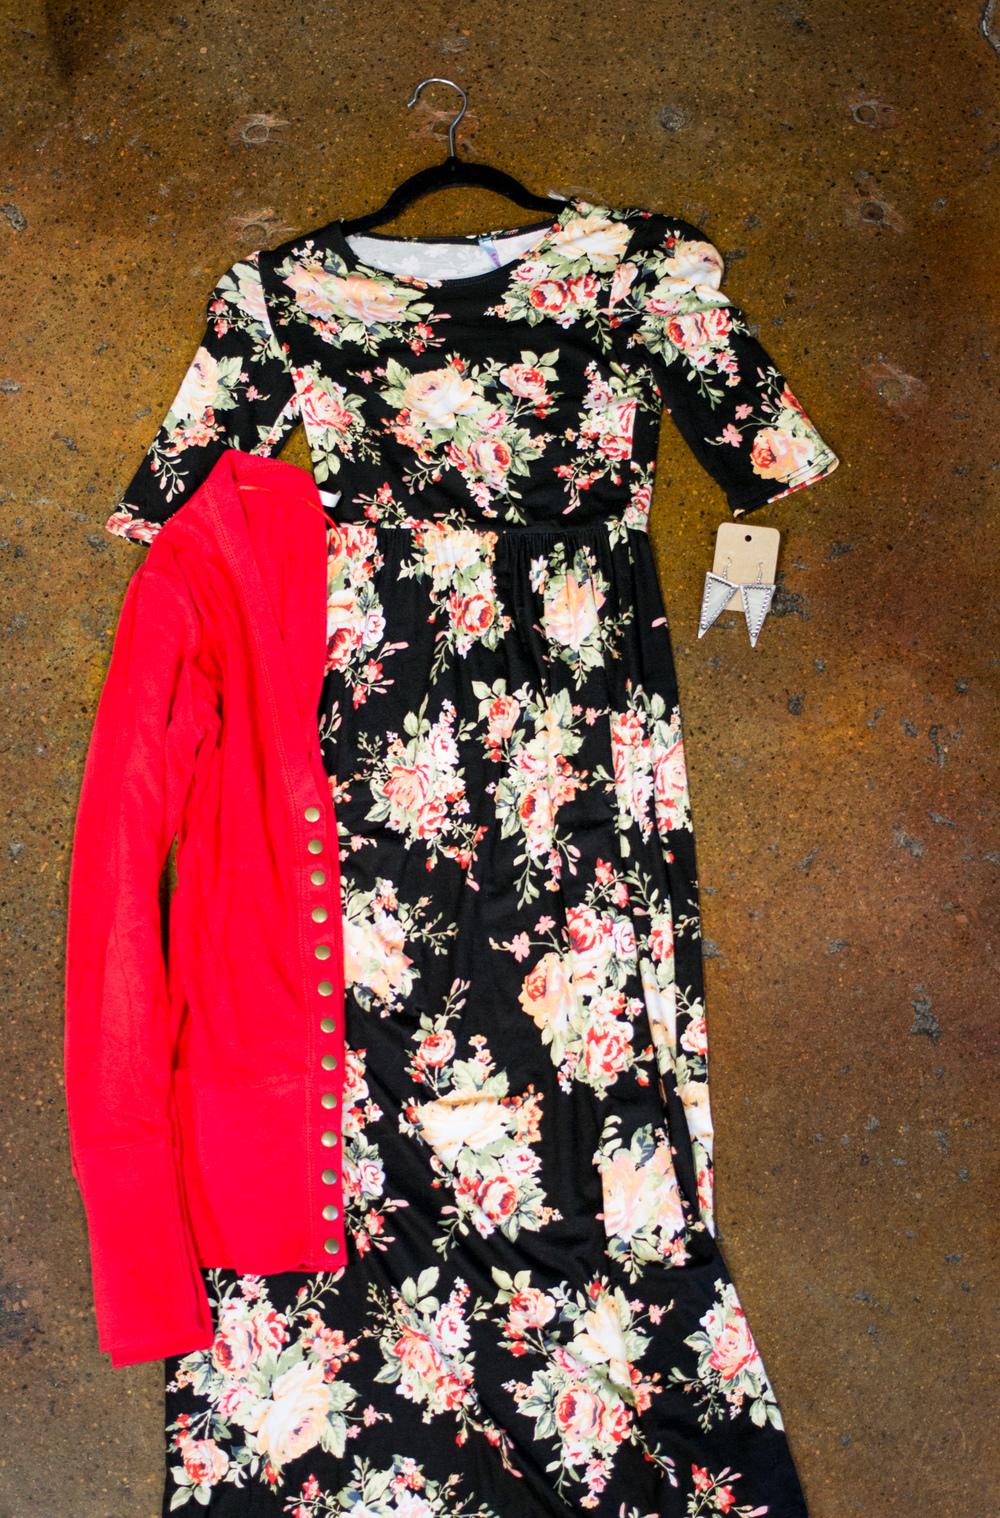 Summer dress. Big Bratt Boutique, Spanish Fork Utah